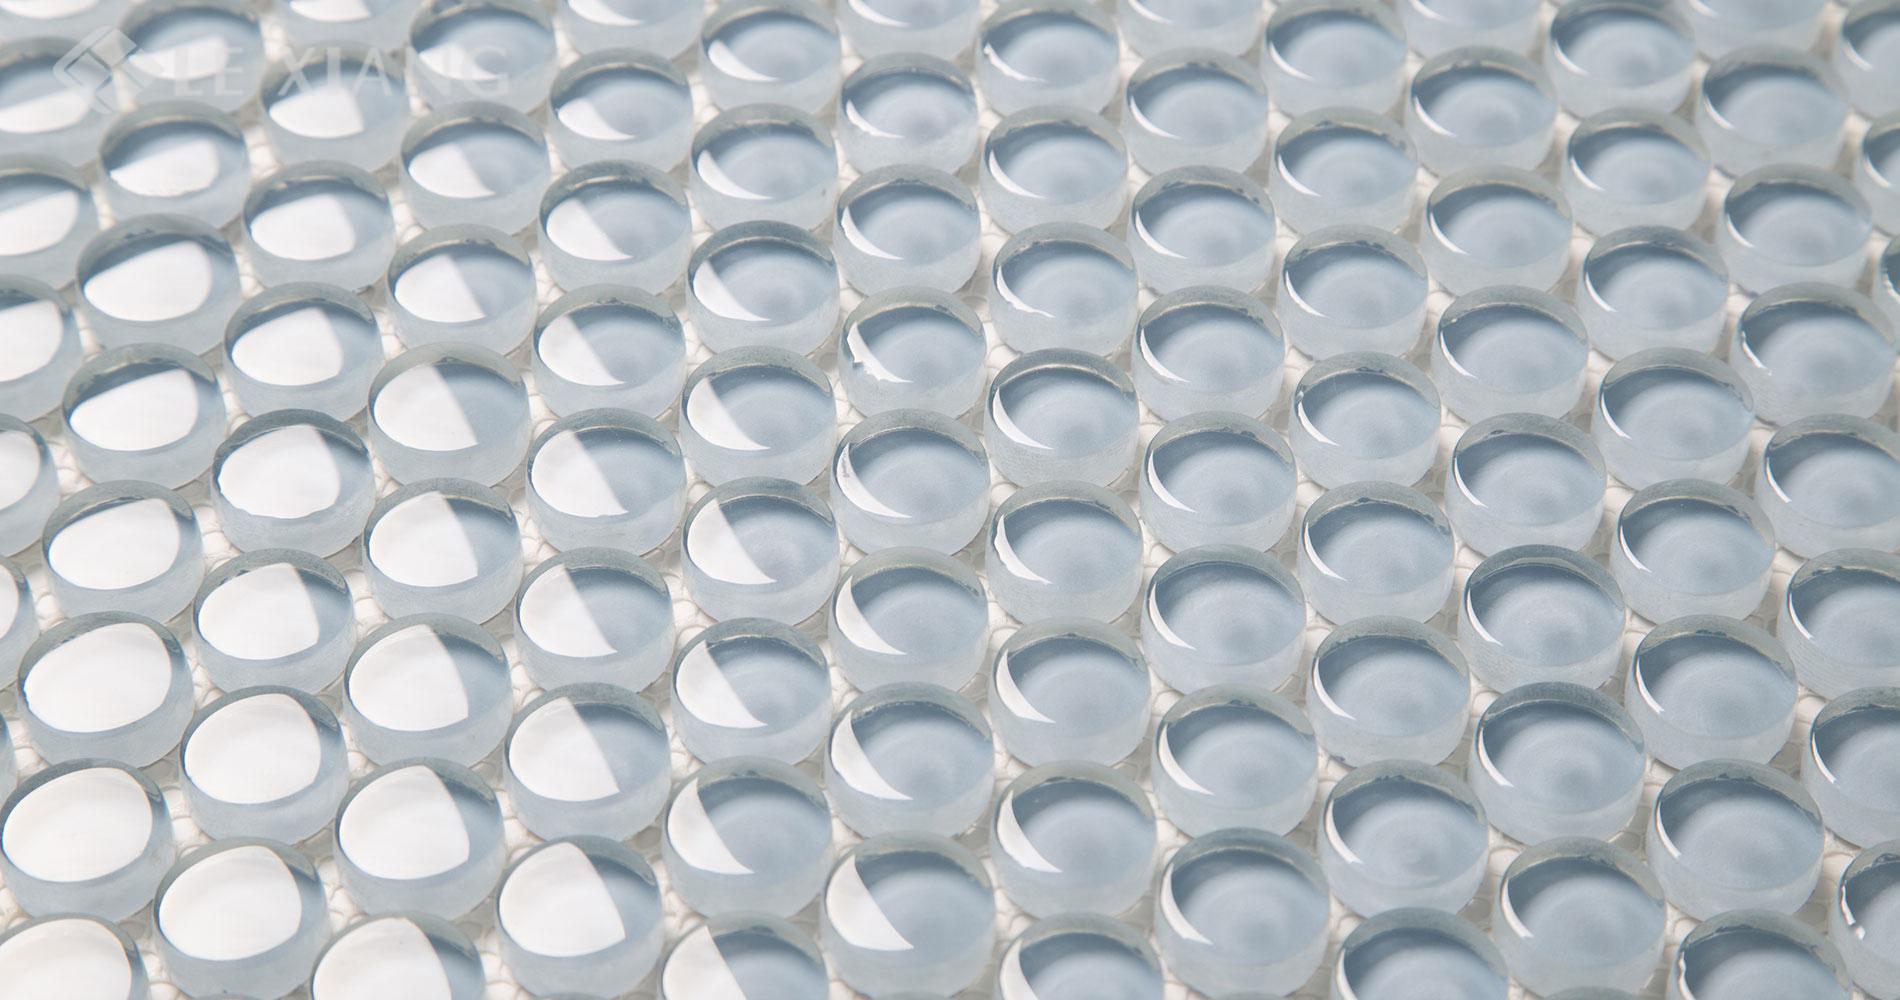 Crystal Glass Penny Round Mosaic Tile Kitchen Backsplash